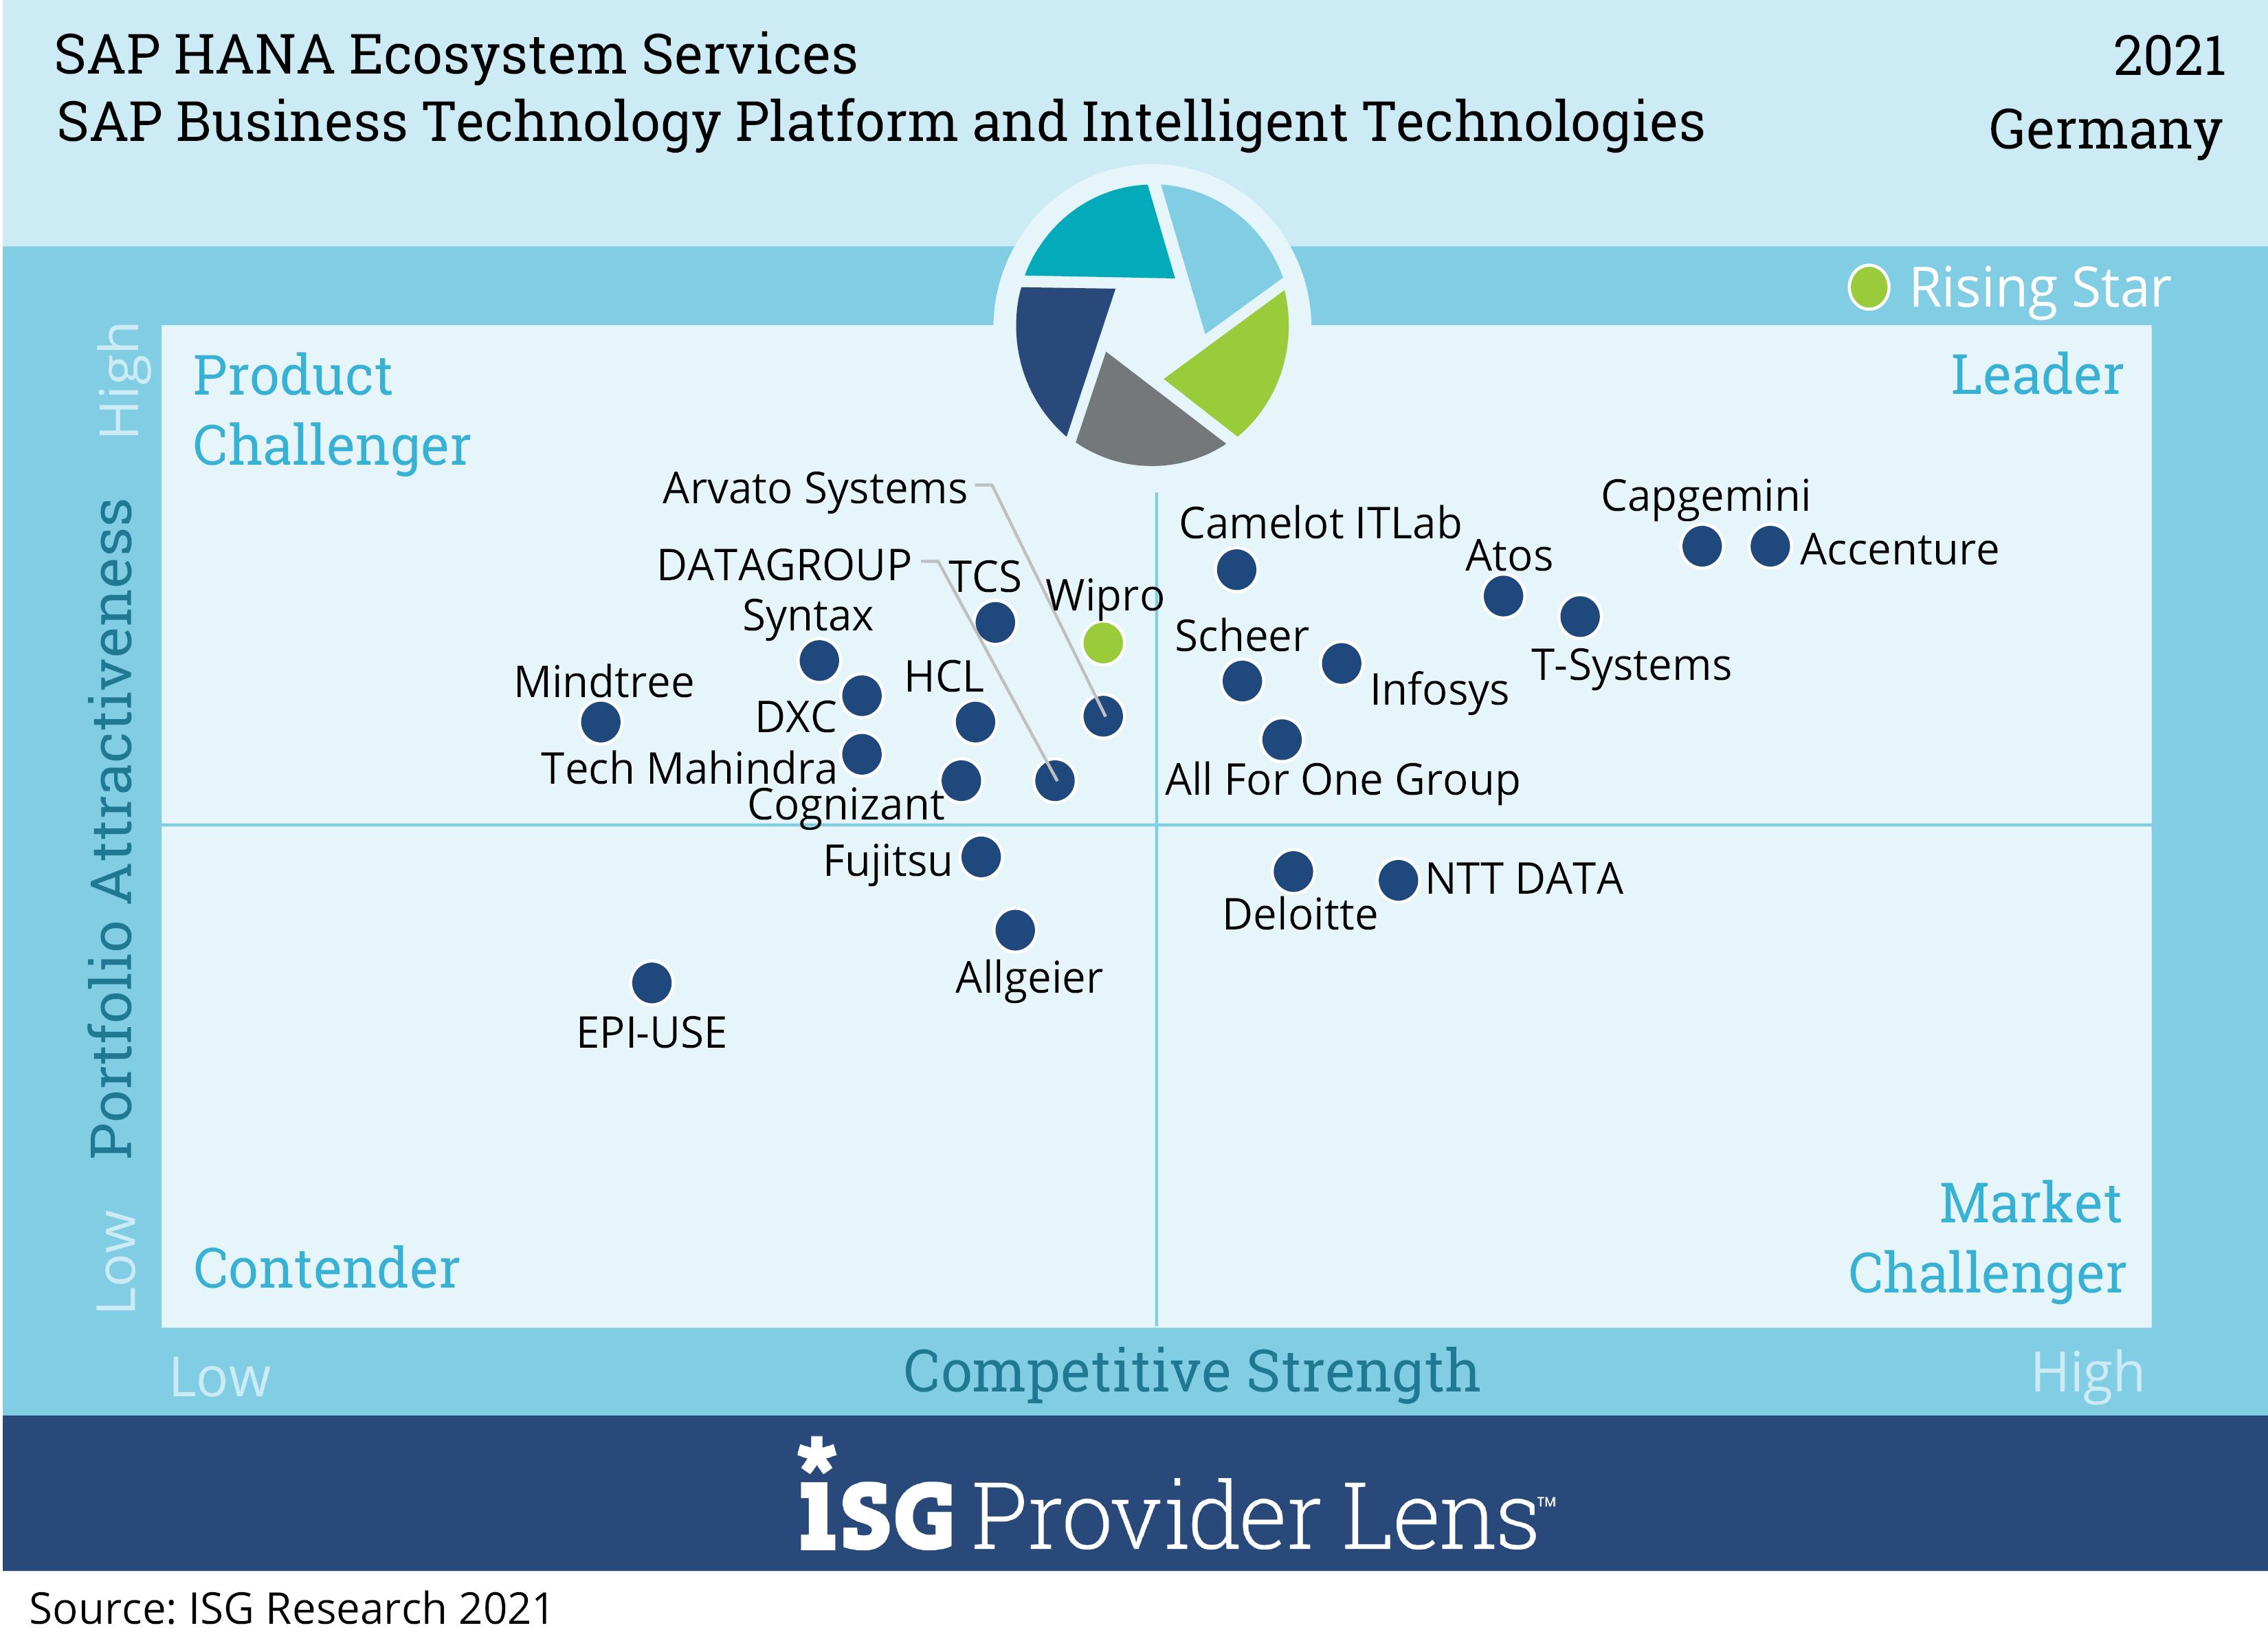 SAP Business Technology Platform and Intelligent Technologies